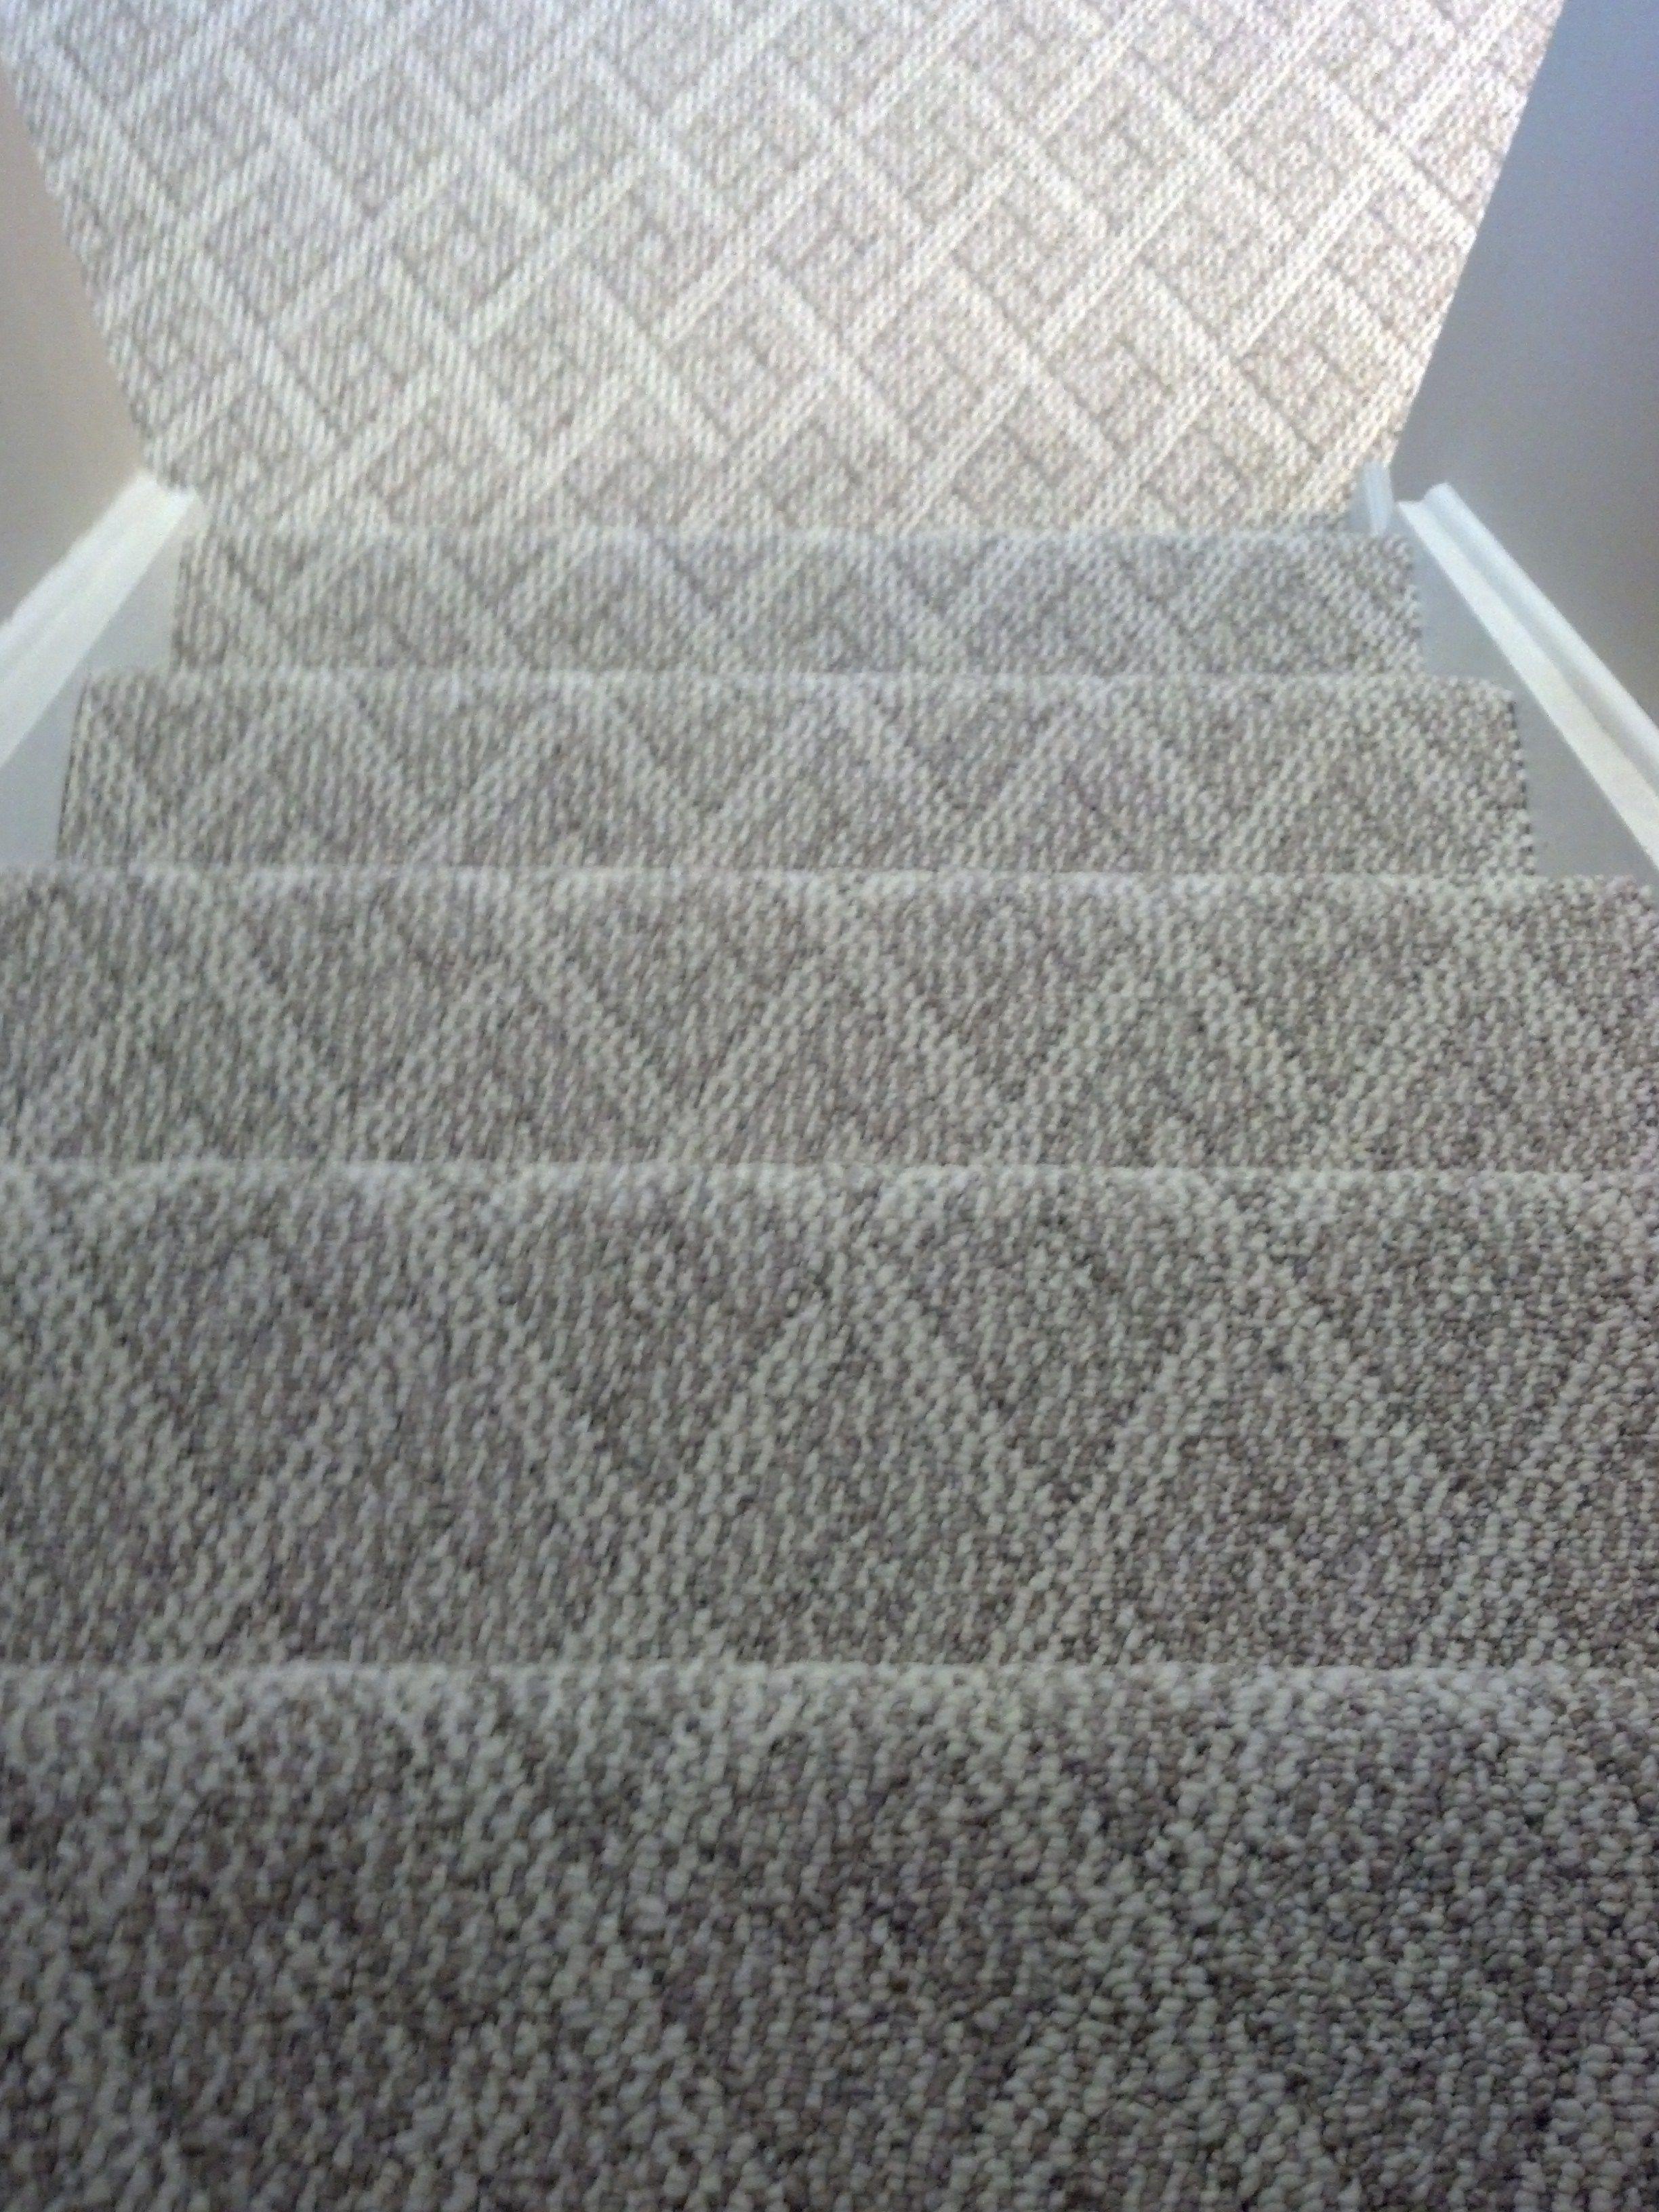 berber carpets berber carpet cincinnati, ohio installed on steps and basement family room.  note.....notice VTNJELJ